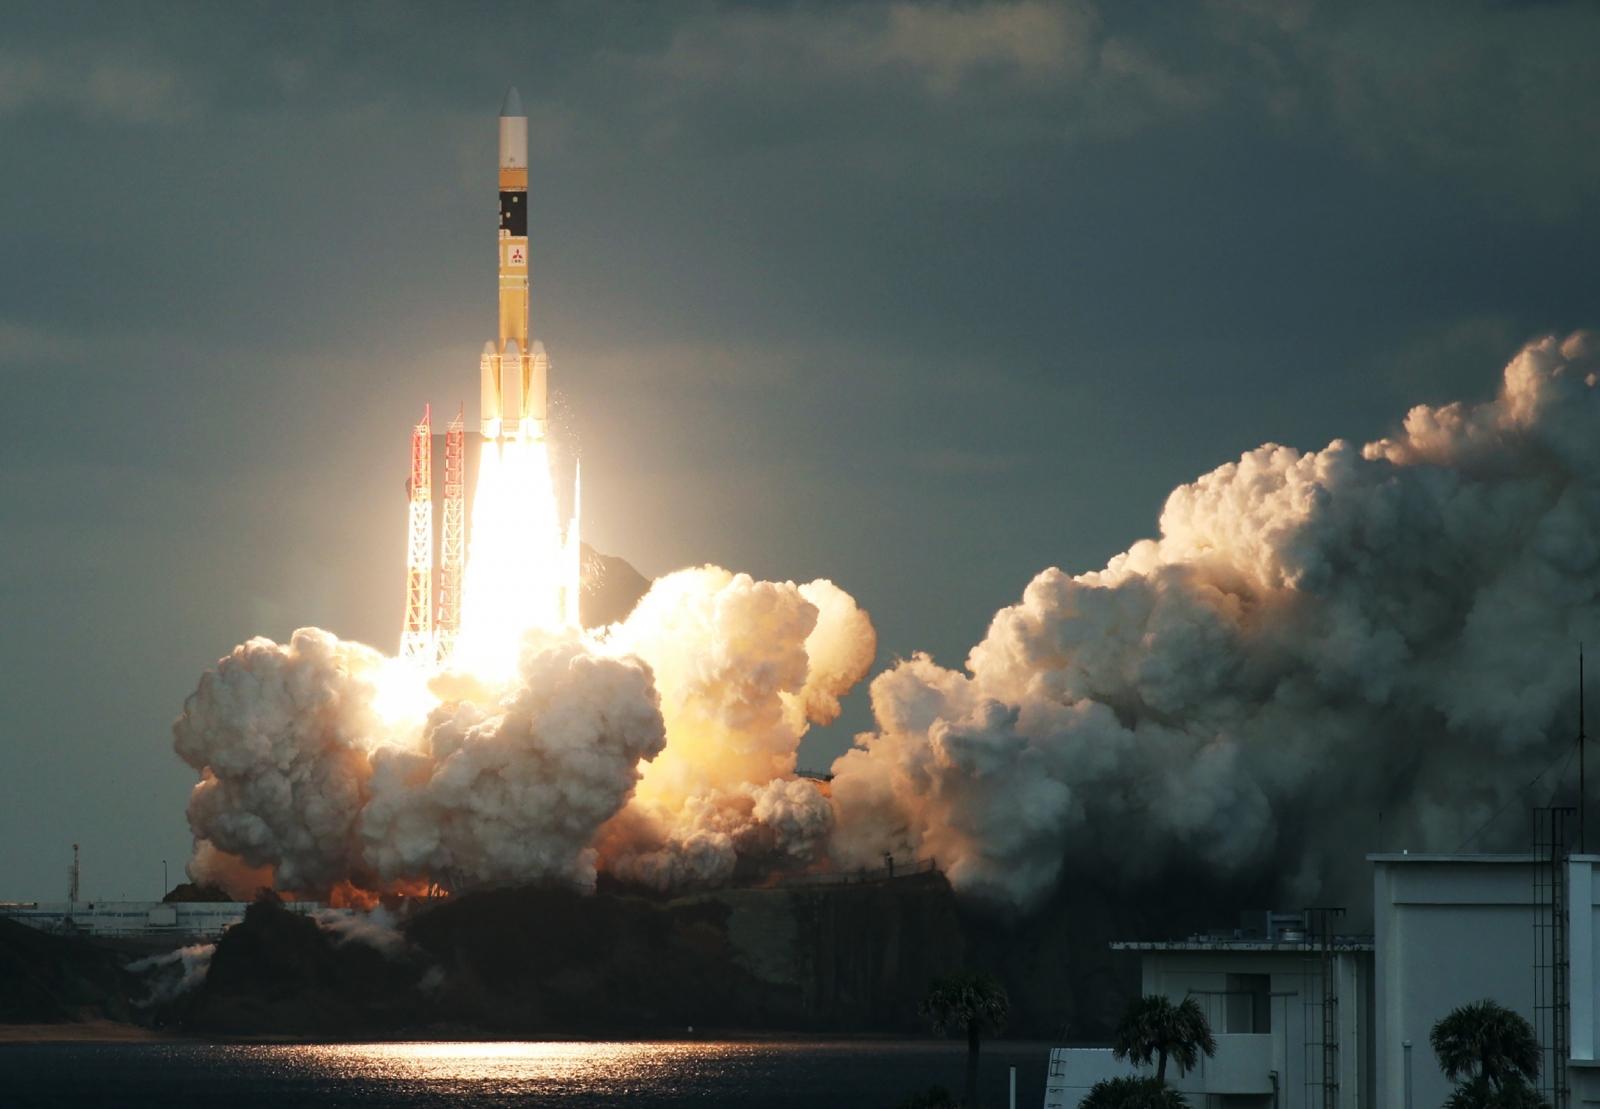 Japan launches defence satellite Kirameki-2